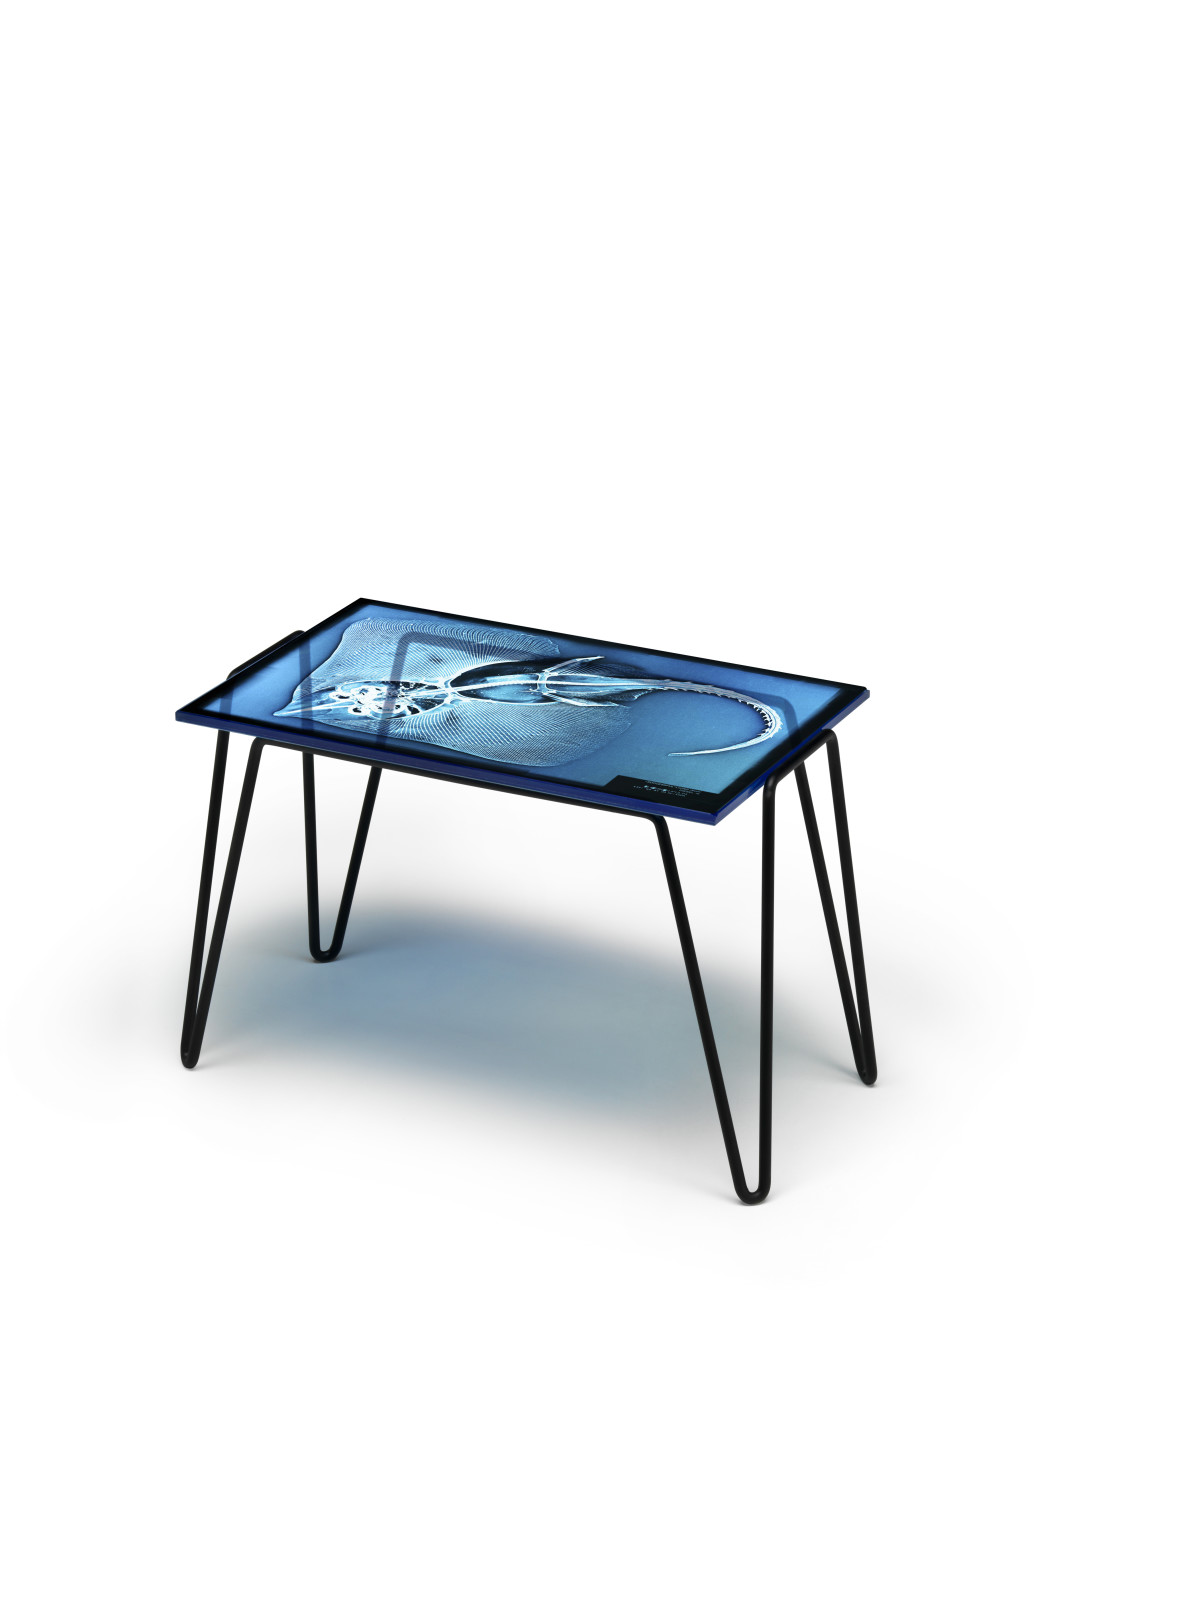 Xradio 1 Razza Side Table